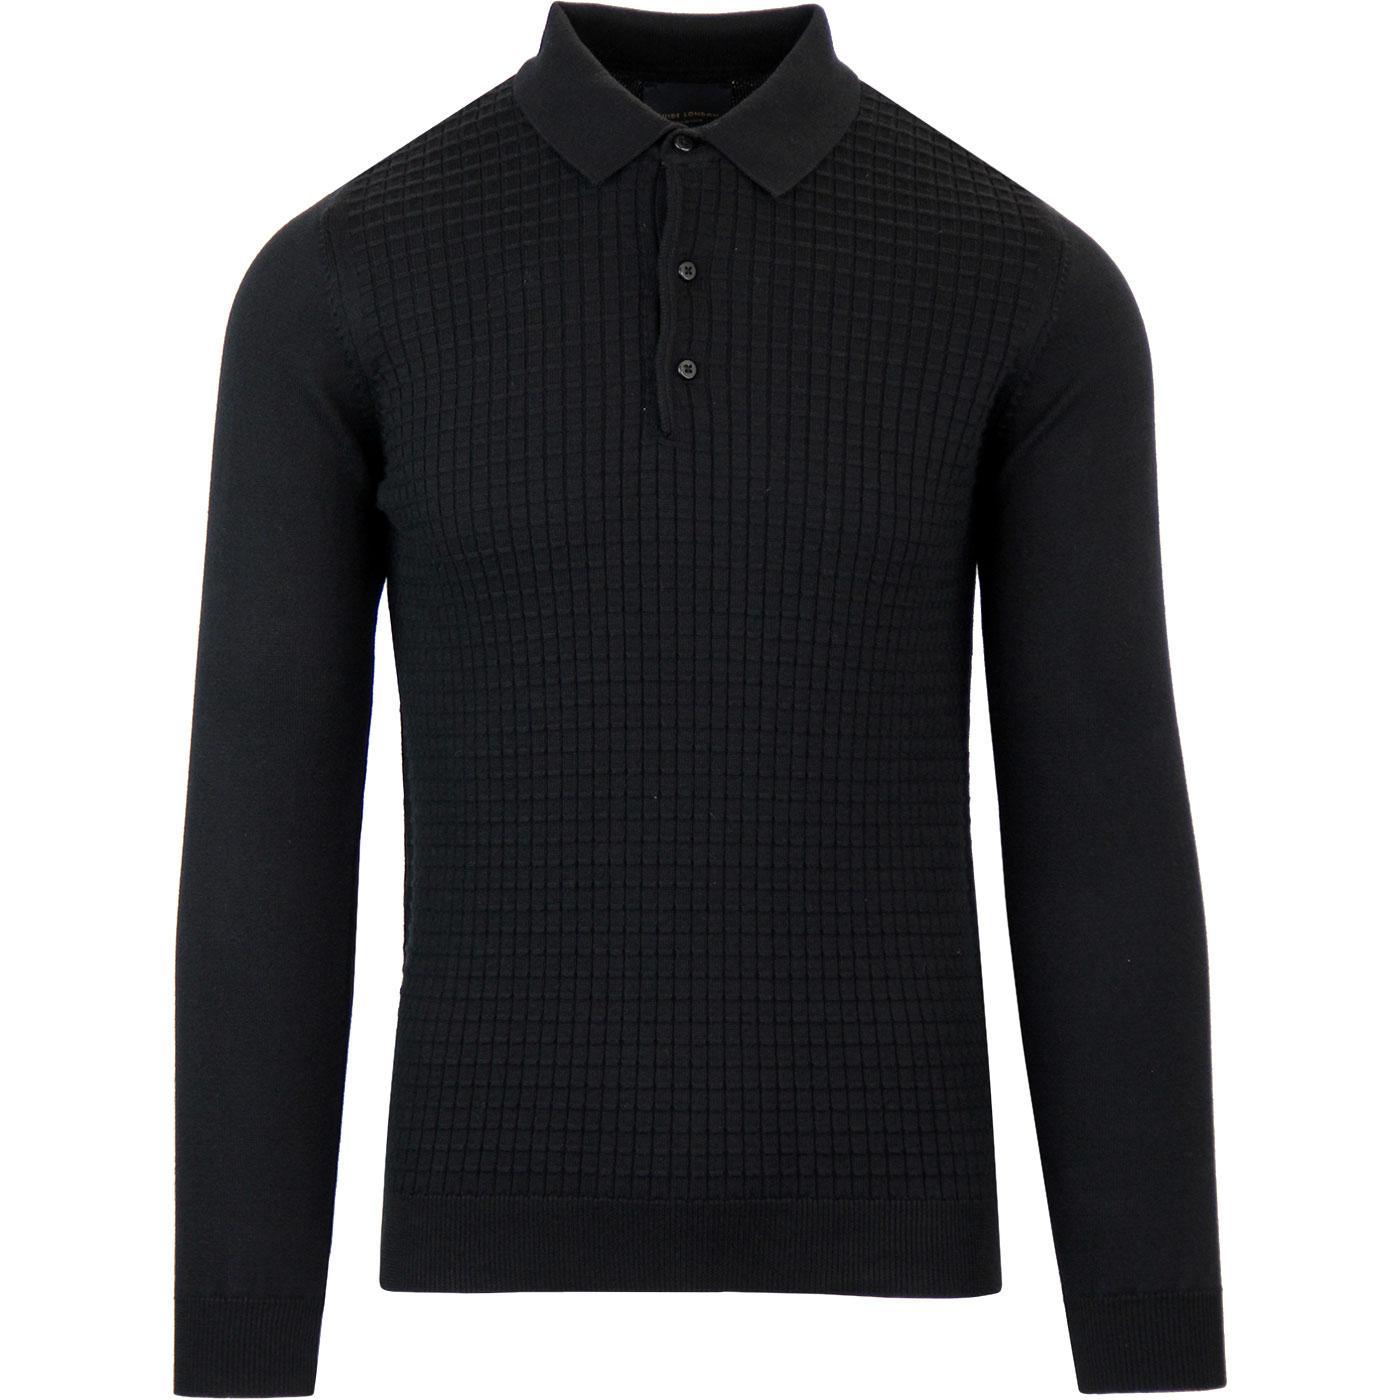 GUIDE LONDON 60s Mod Waffle Knit Polo Shirt BLACK